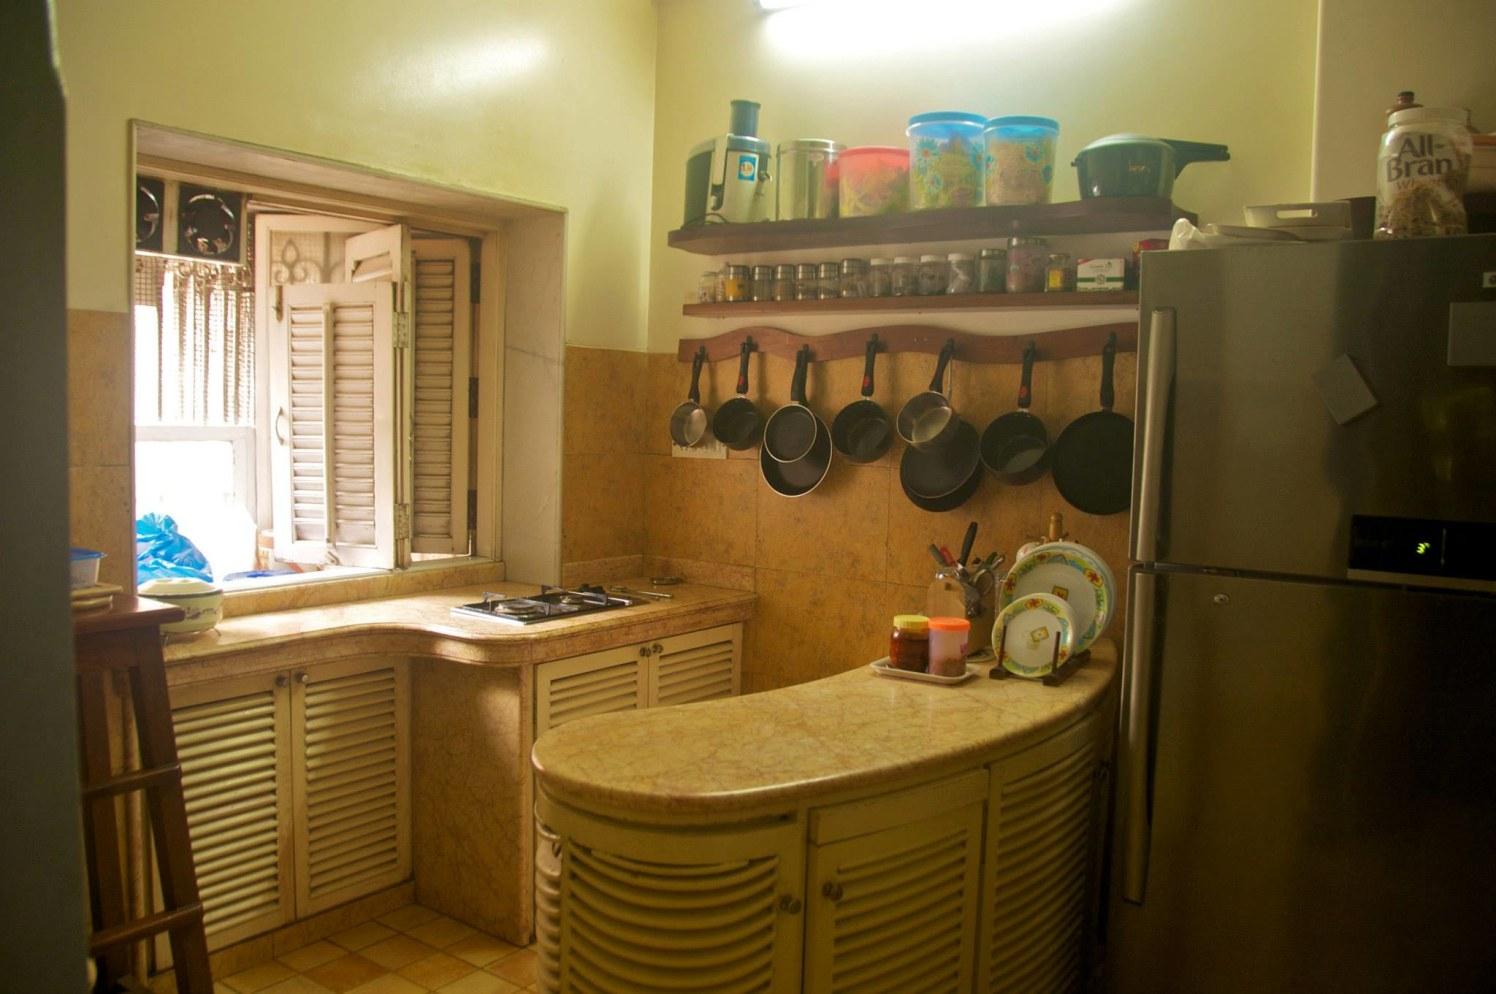 Compact Modular Kitchen with Marble Counter Top by Viraf Laskari  Modular-kitchen Minimalistic | Interior Design Photos & Ideas